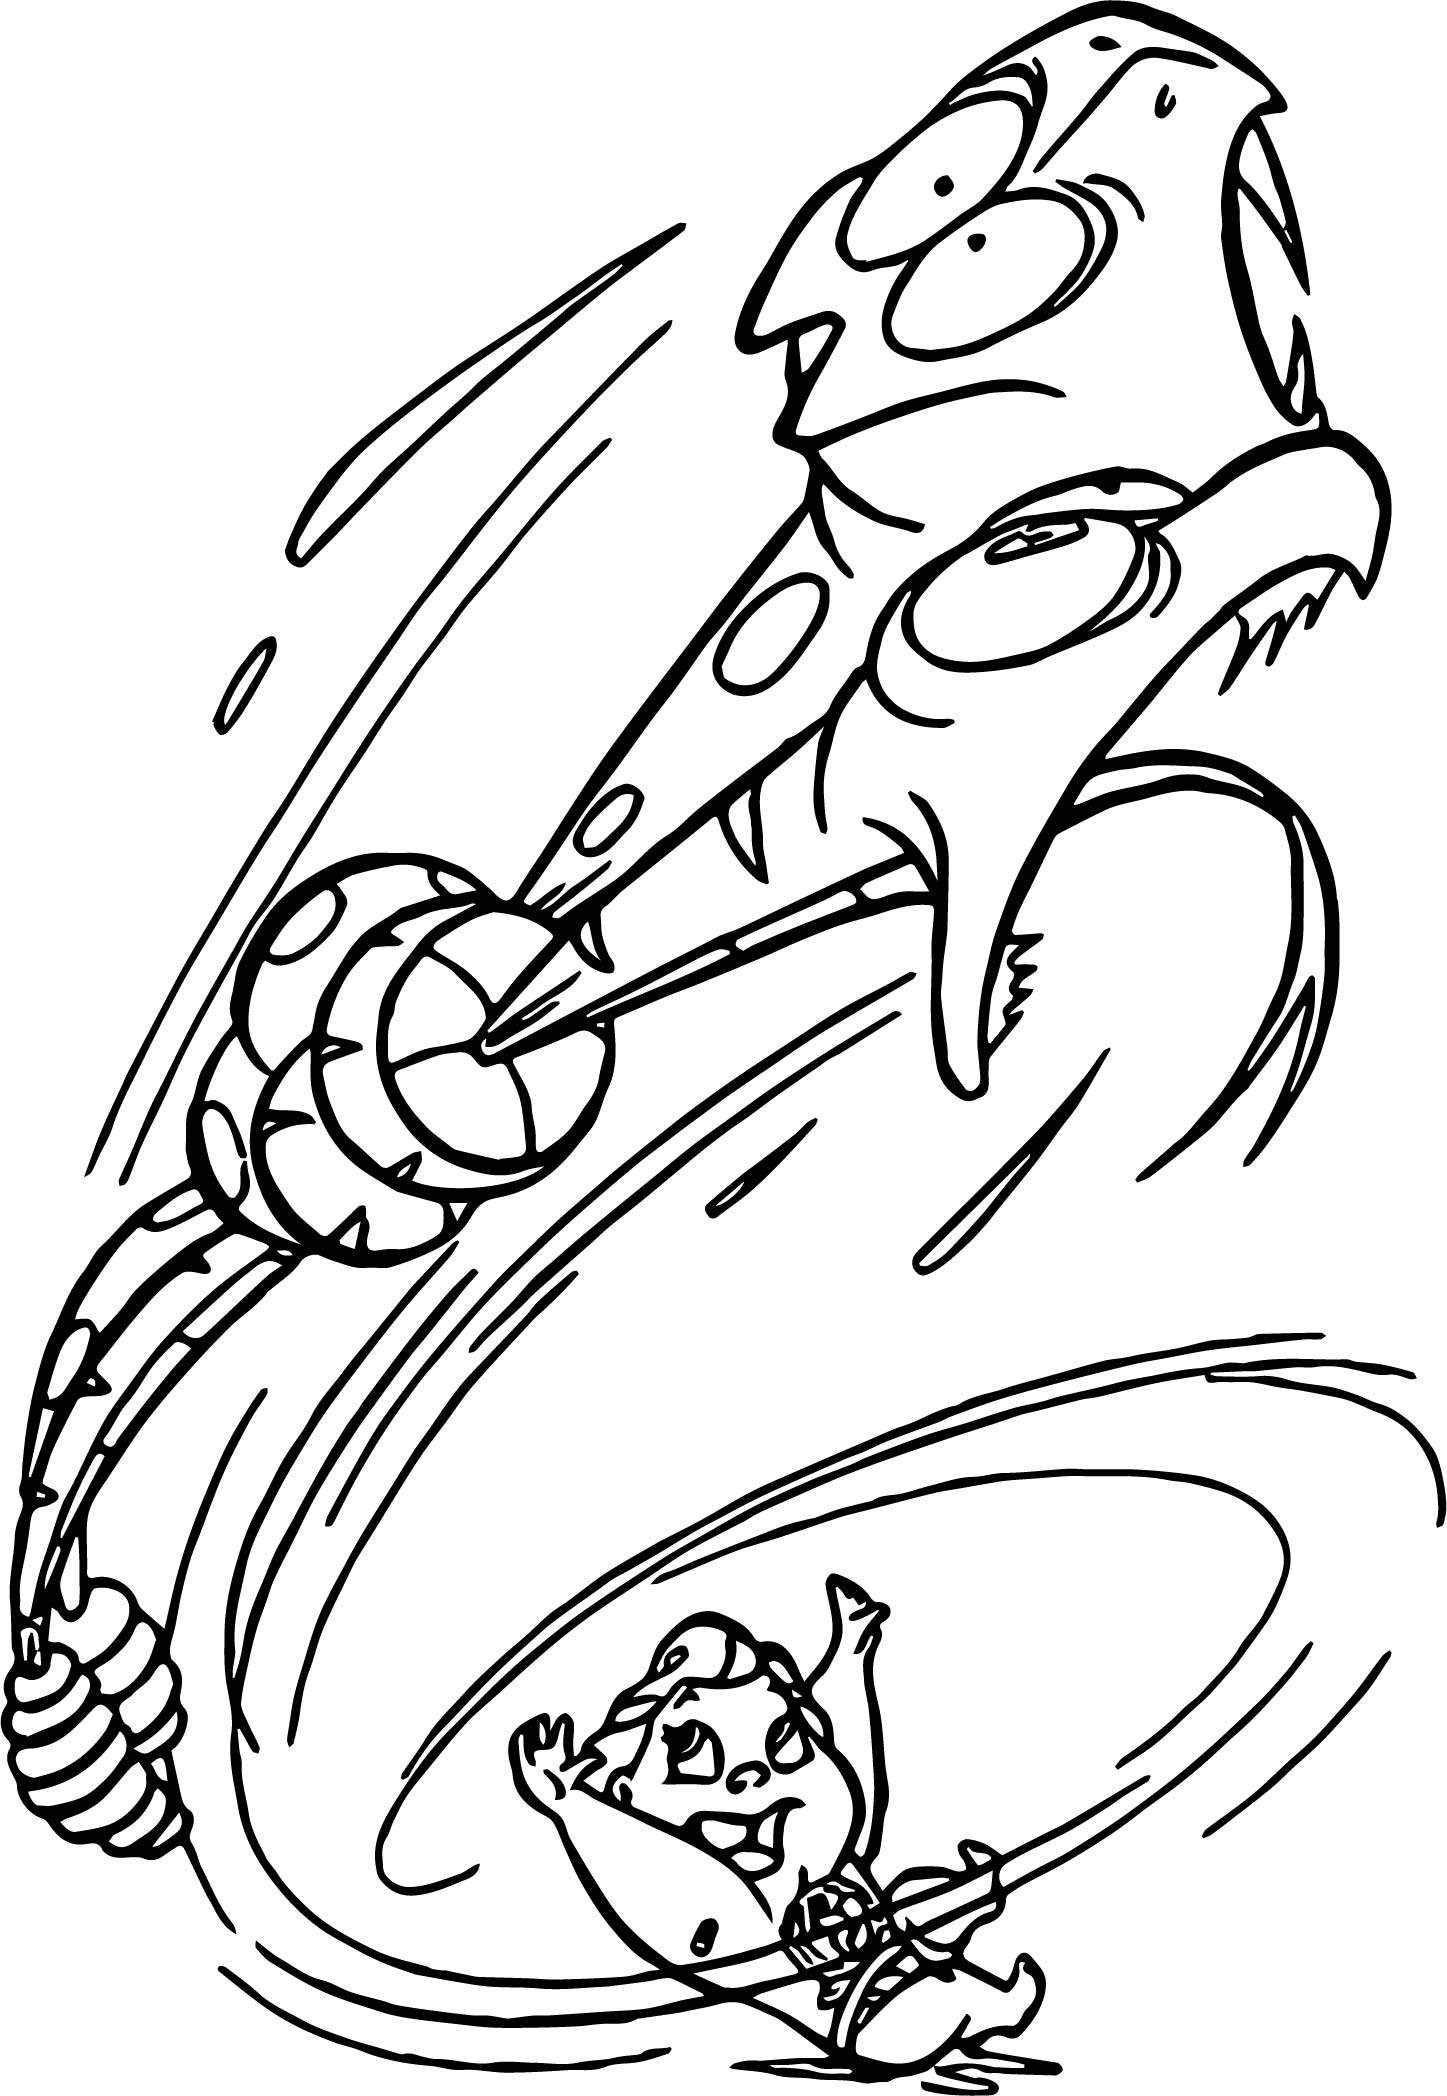 Baby Hercules Throw Creatures Coloring PagesBaby Hercules Throw Creatures Coloring Pages